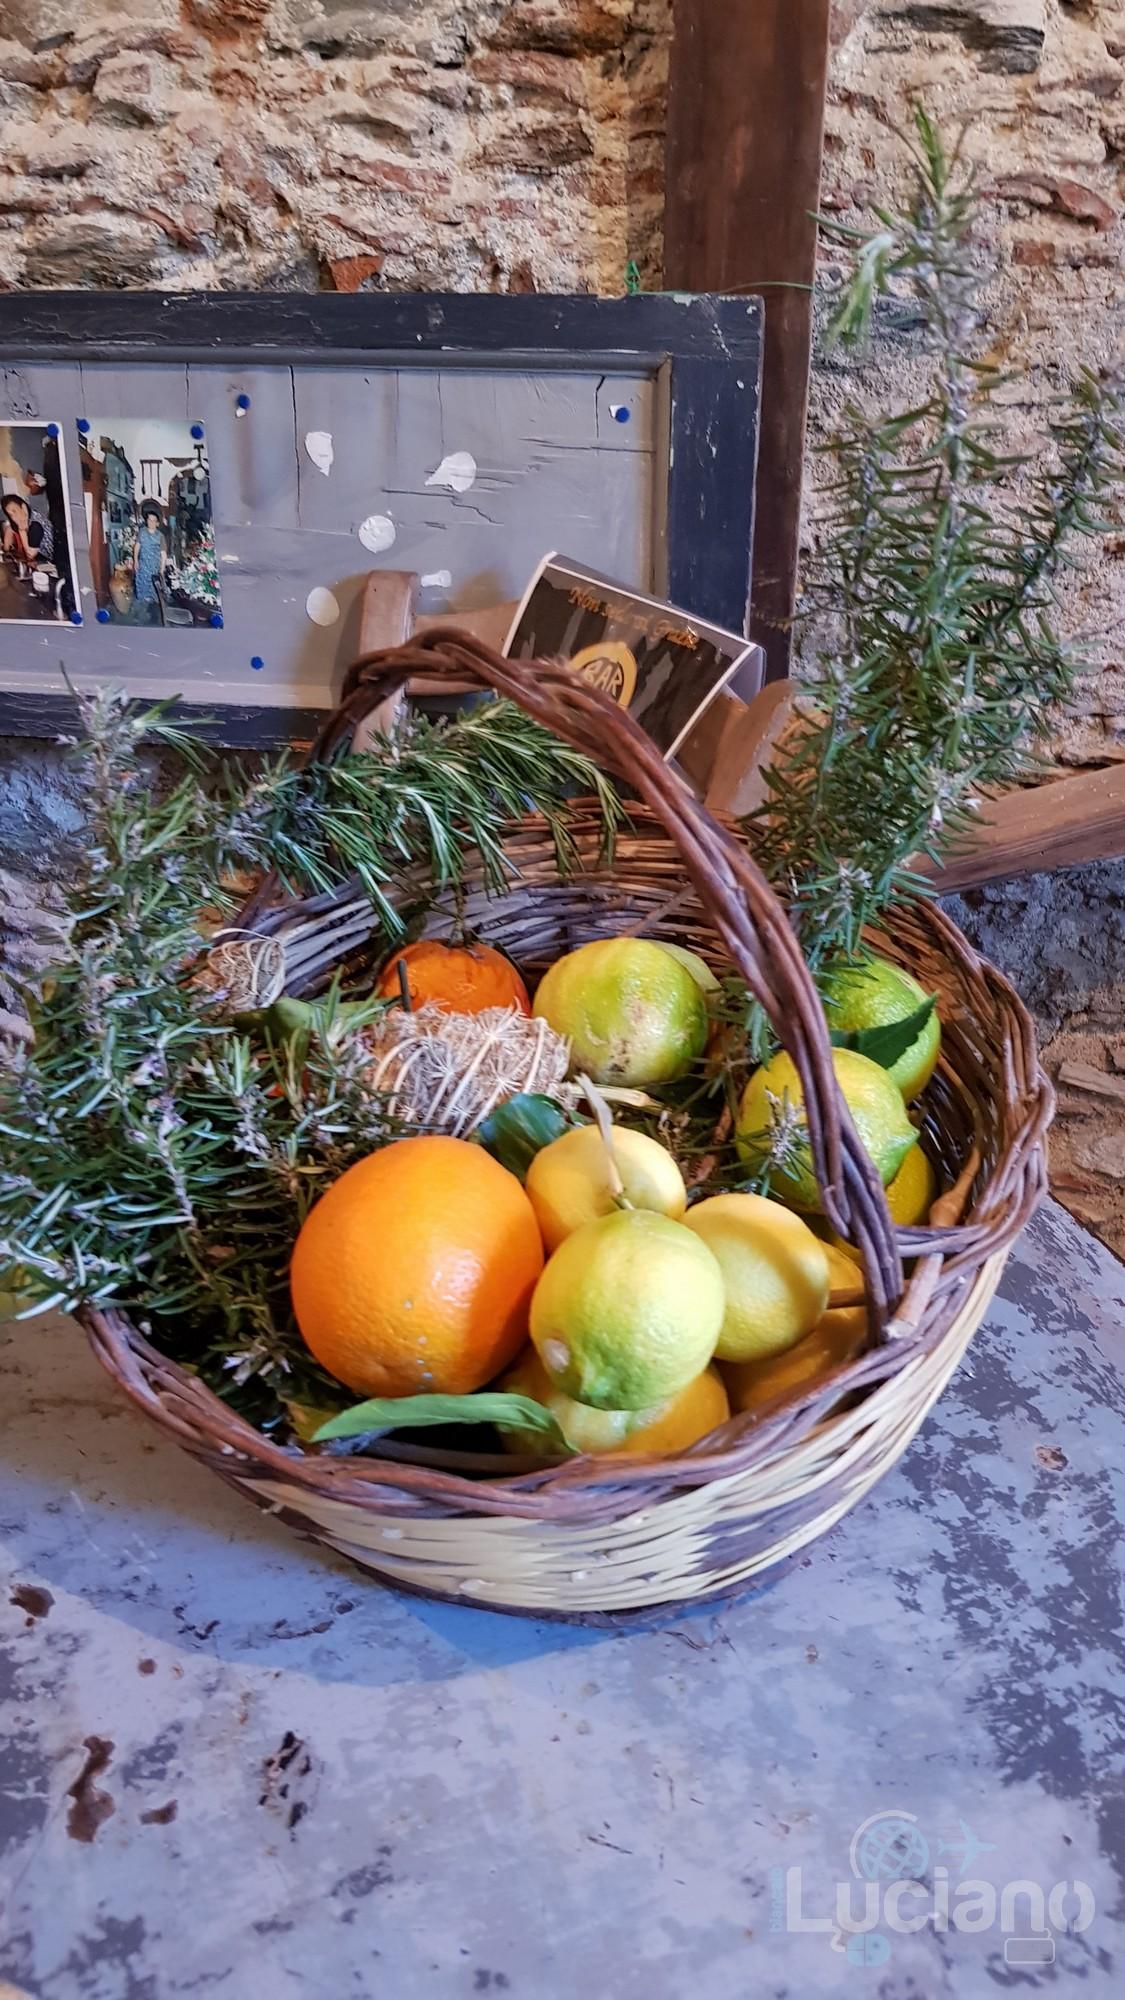 panaru agrumi - cesto con agrumi